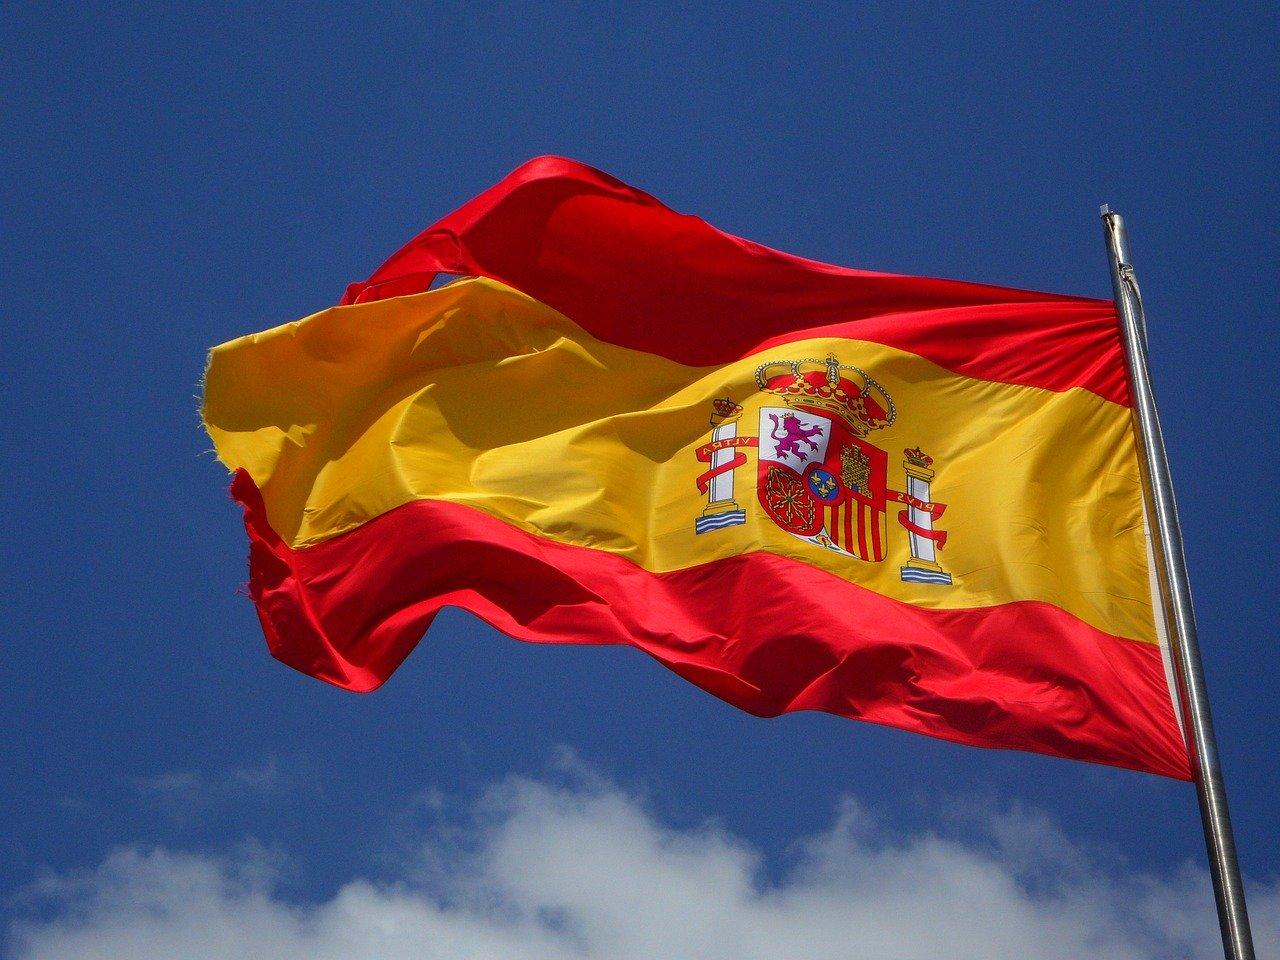 Coronavirus: Langsamerer Anstieg bei Corona-Opfern in Spanien nährt Hoffnung